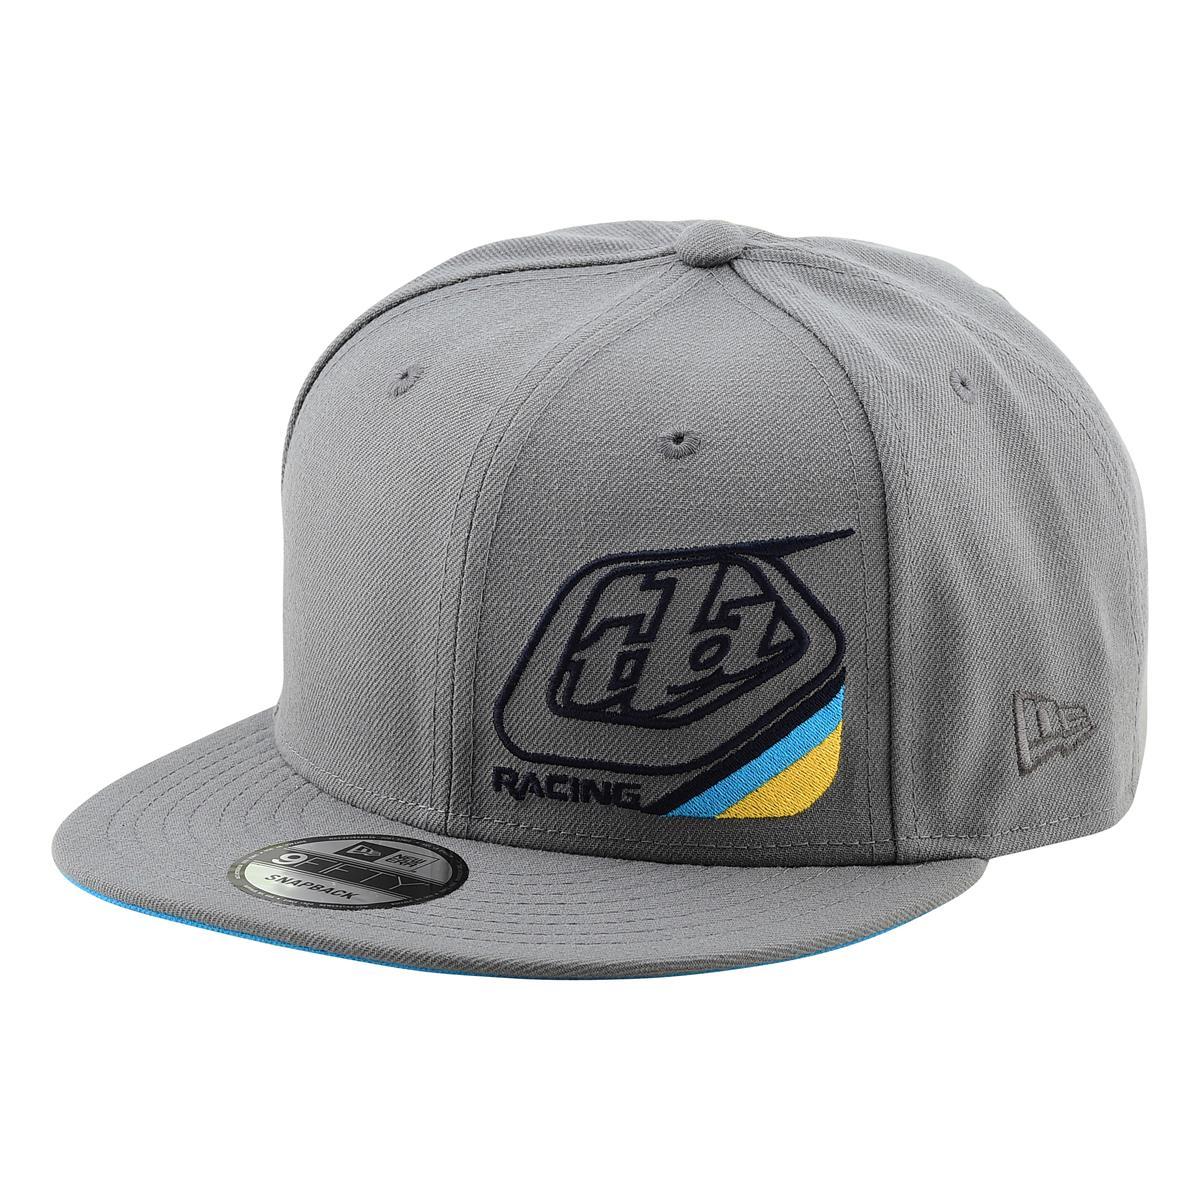 Troy Lee Designs Snapback Cap Precision 2.0 Storm Gray